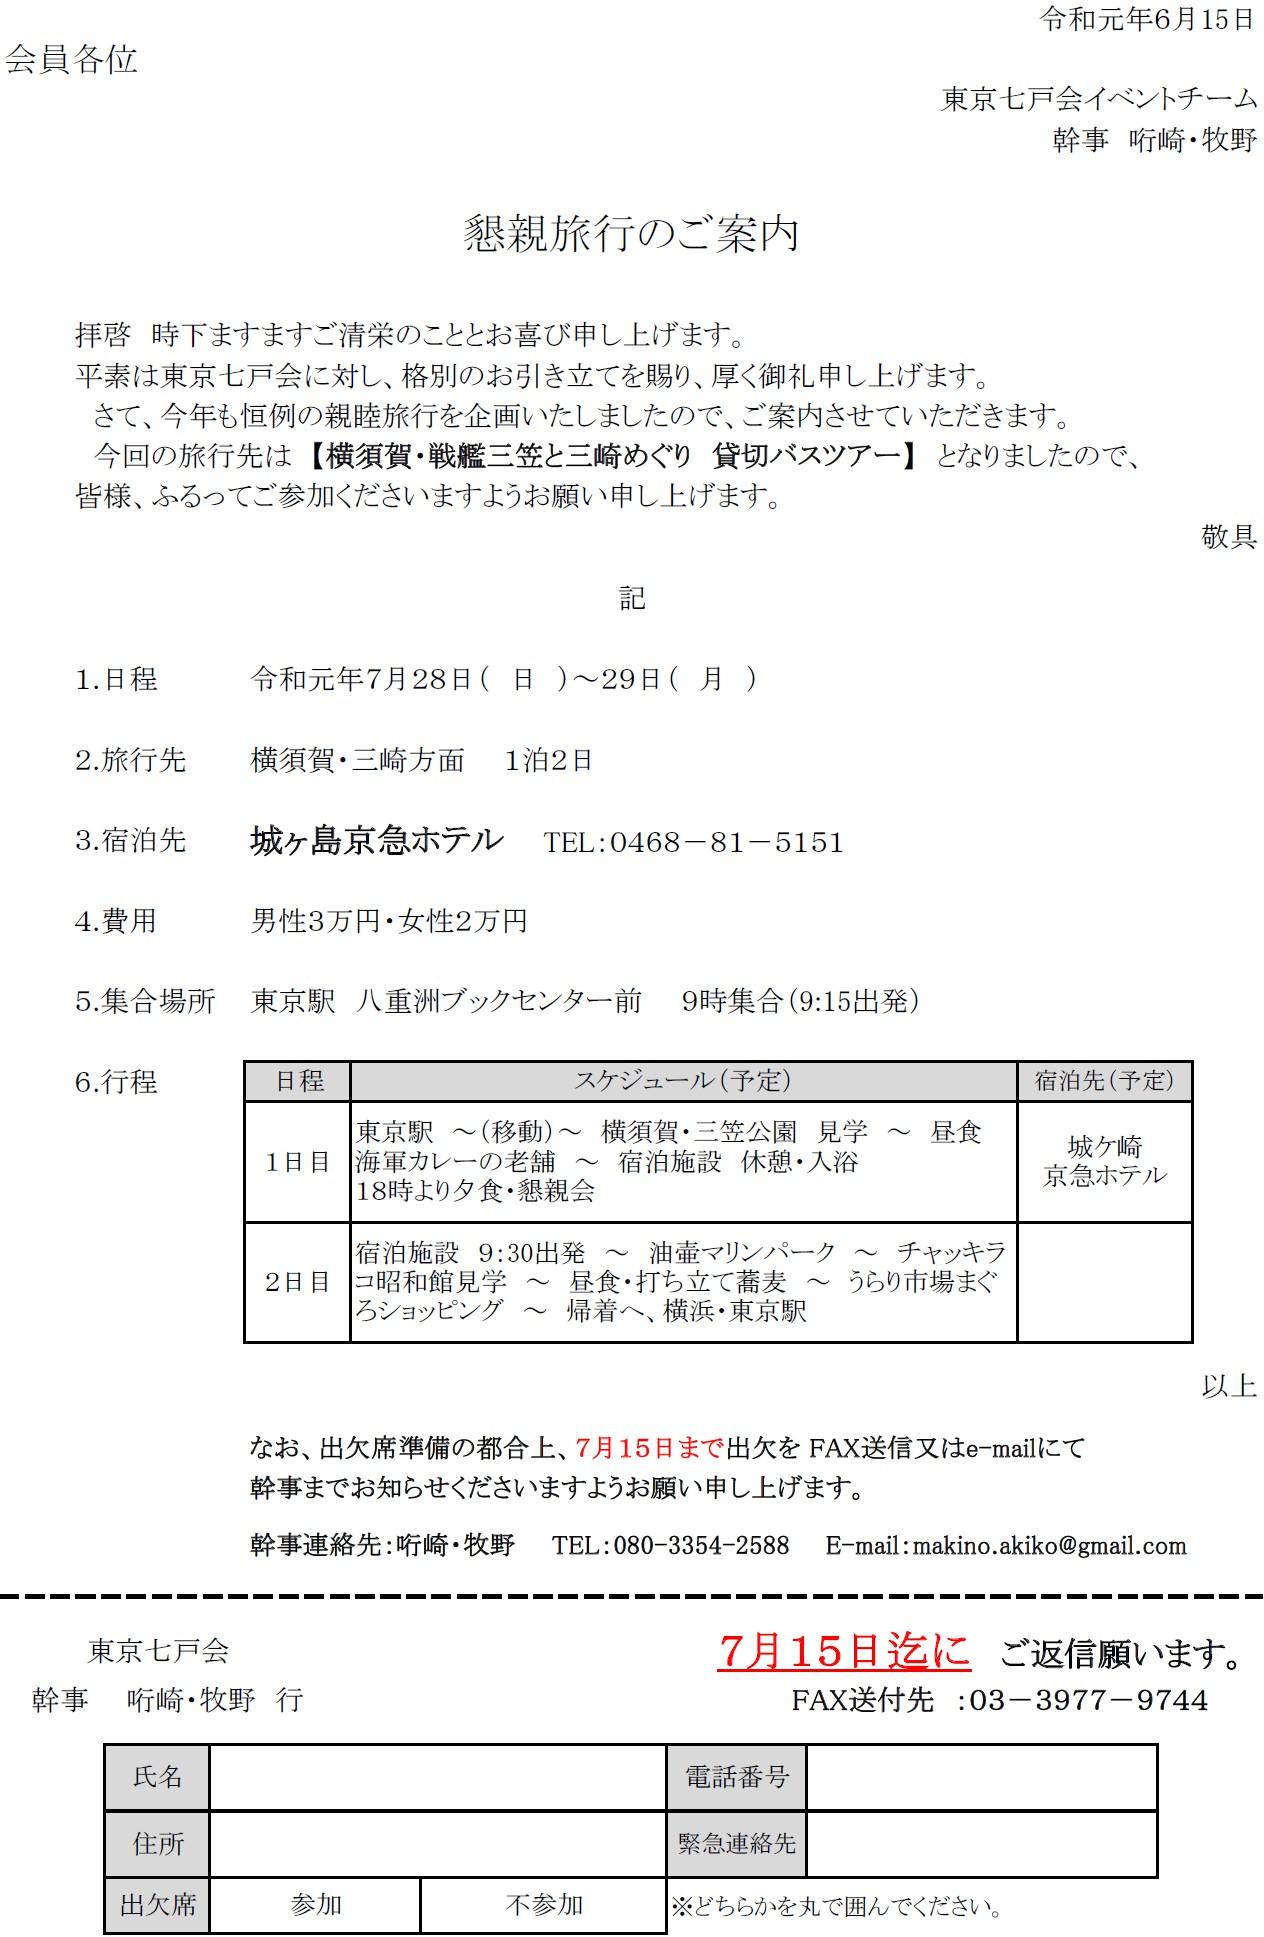 2019年7月28,29日開催東京七戸会、懇親旅行のご案内